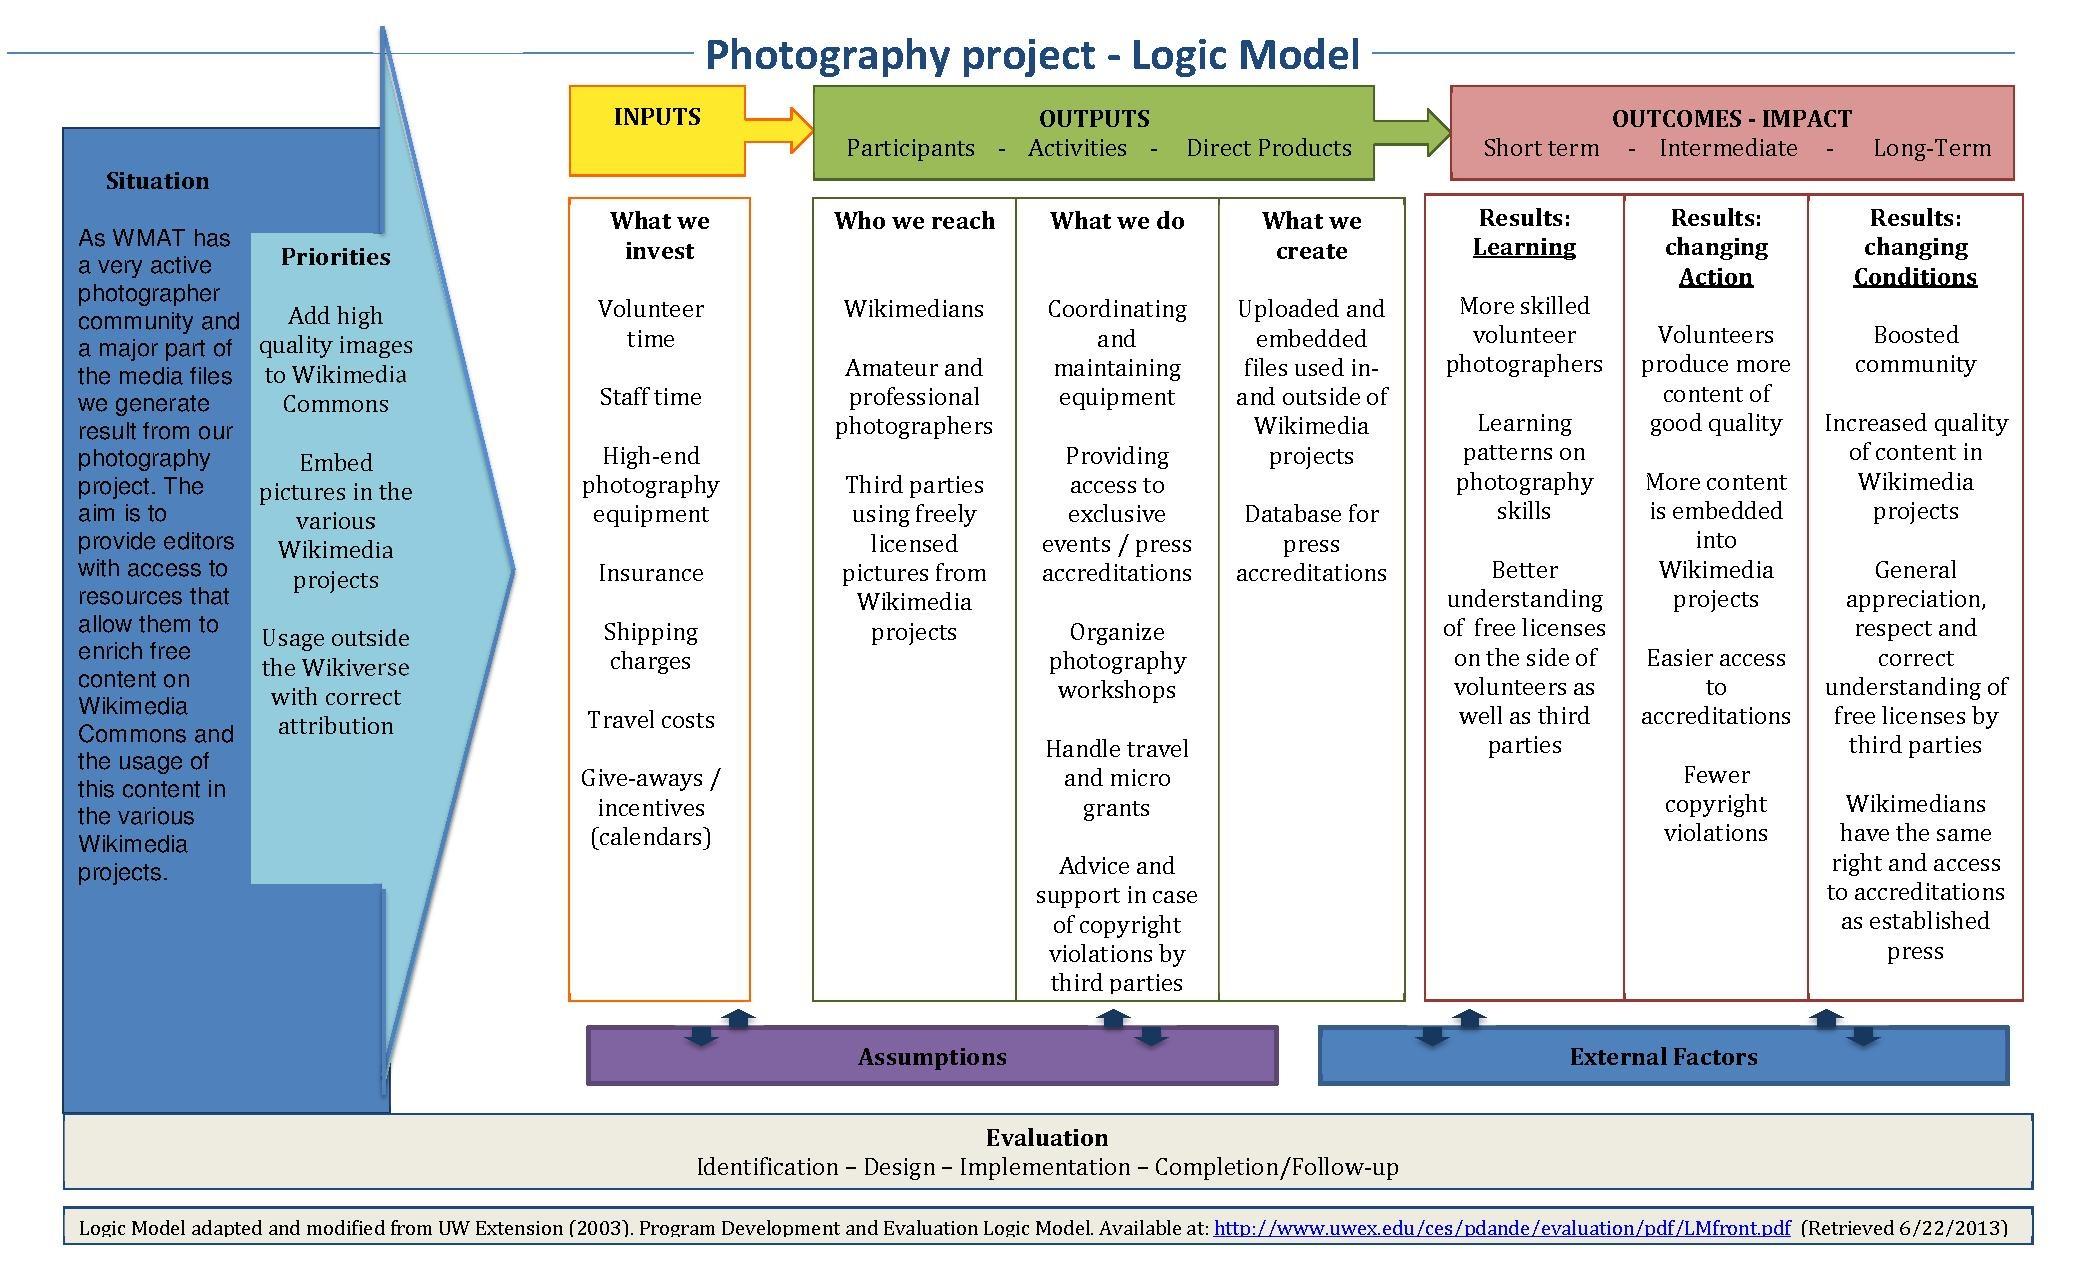 File Logic Model Photography Project